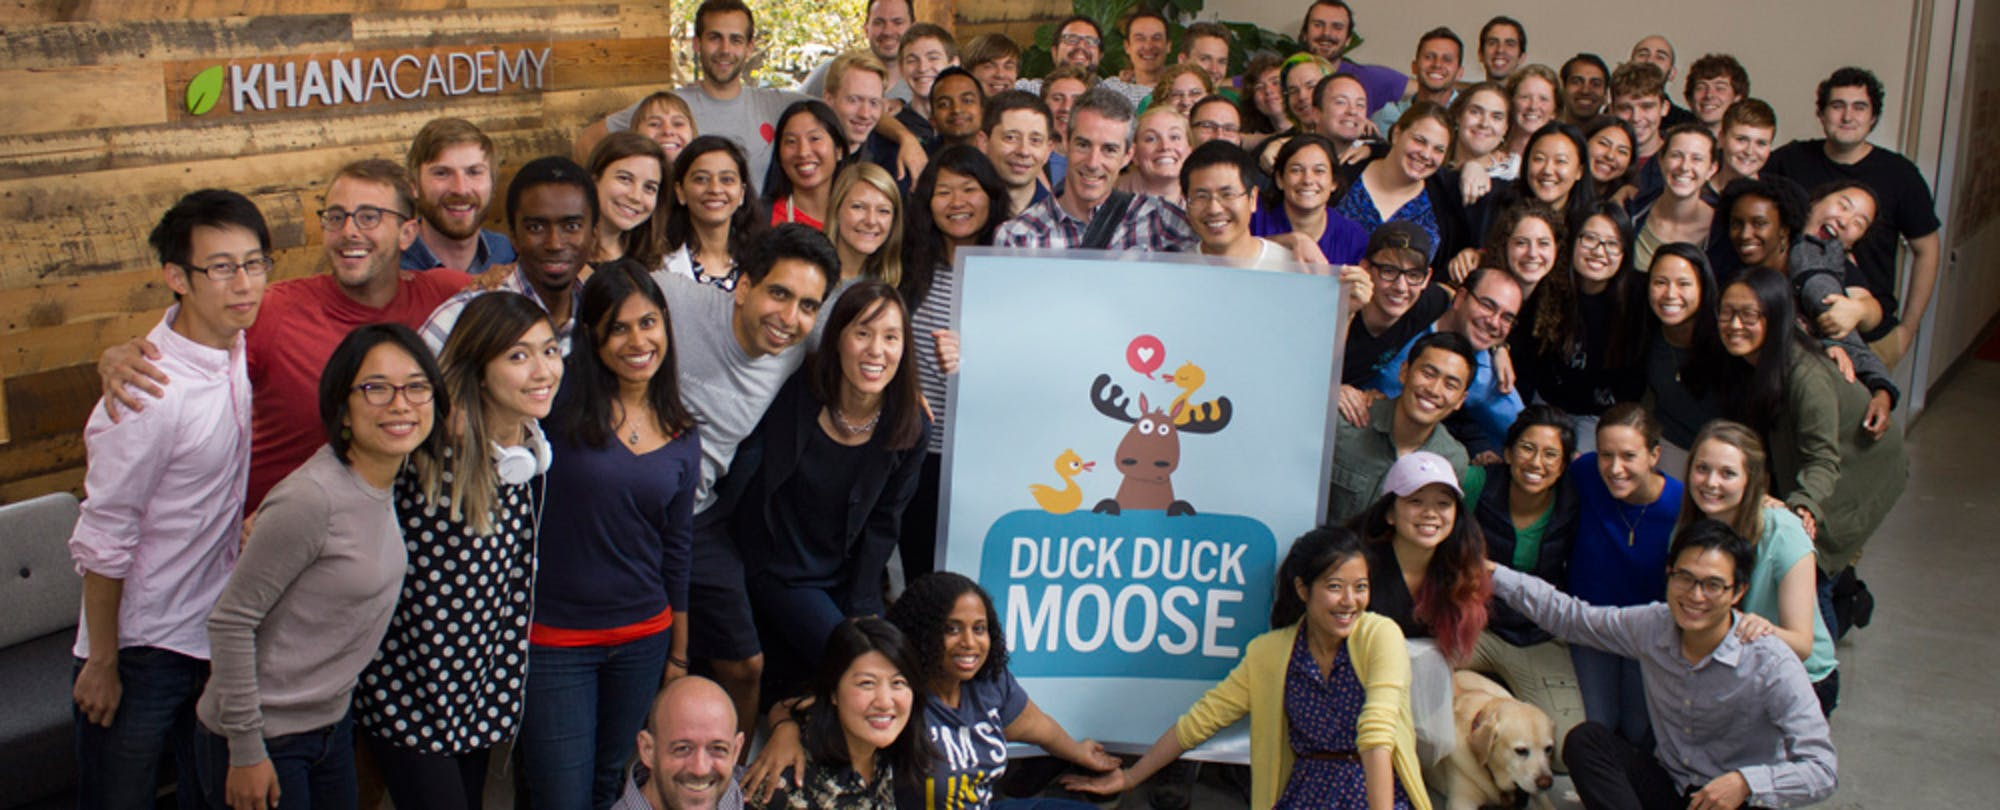 Khan Academy Buys Children's App Developer, Duck Duck Moose, For $1